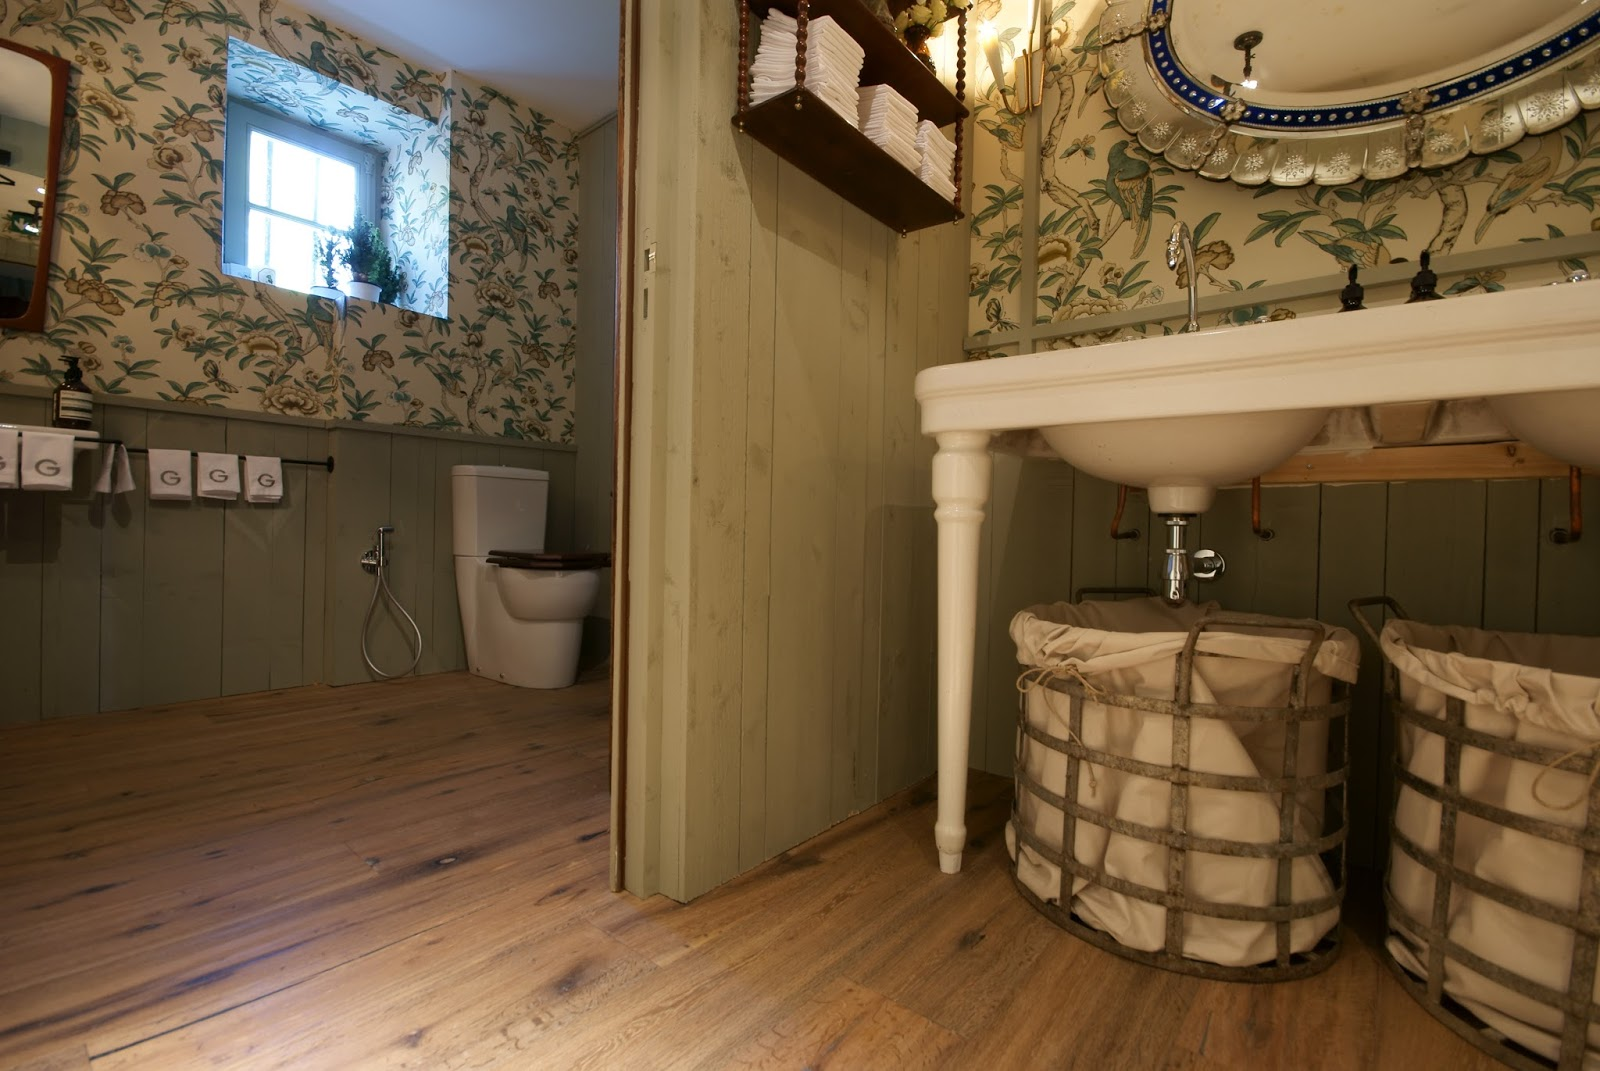 arteclio obras y reformas gaztelur biarritz. Black Bedroom Furniture Sets. Home Design Ideas